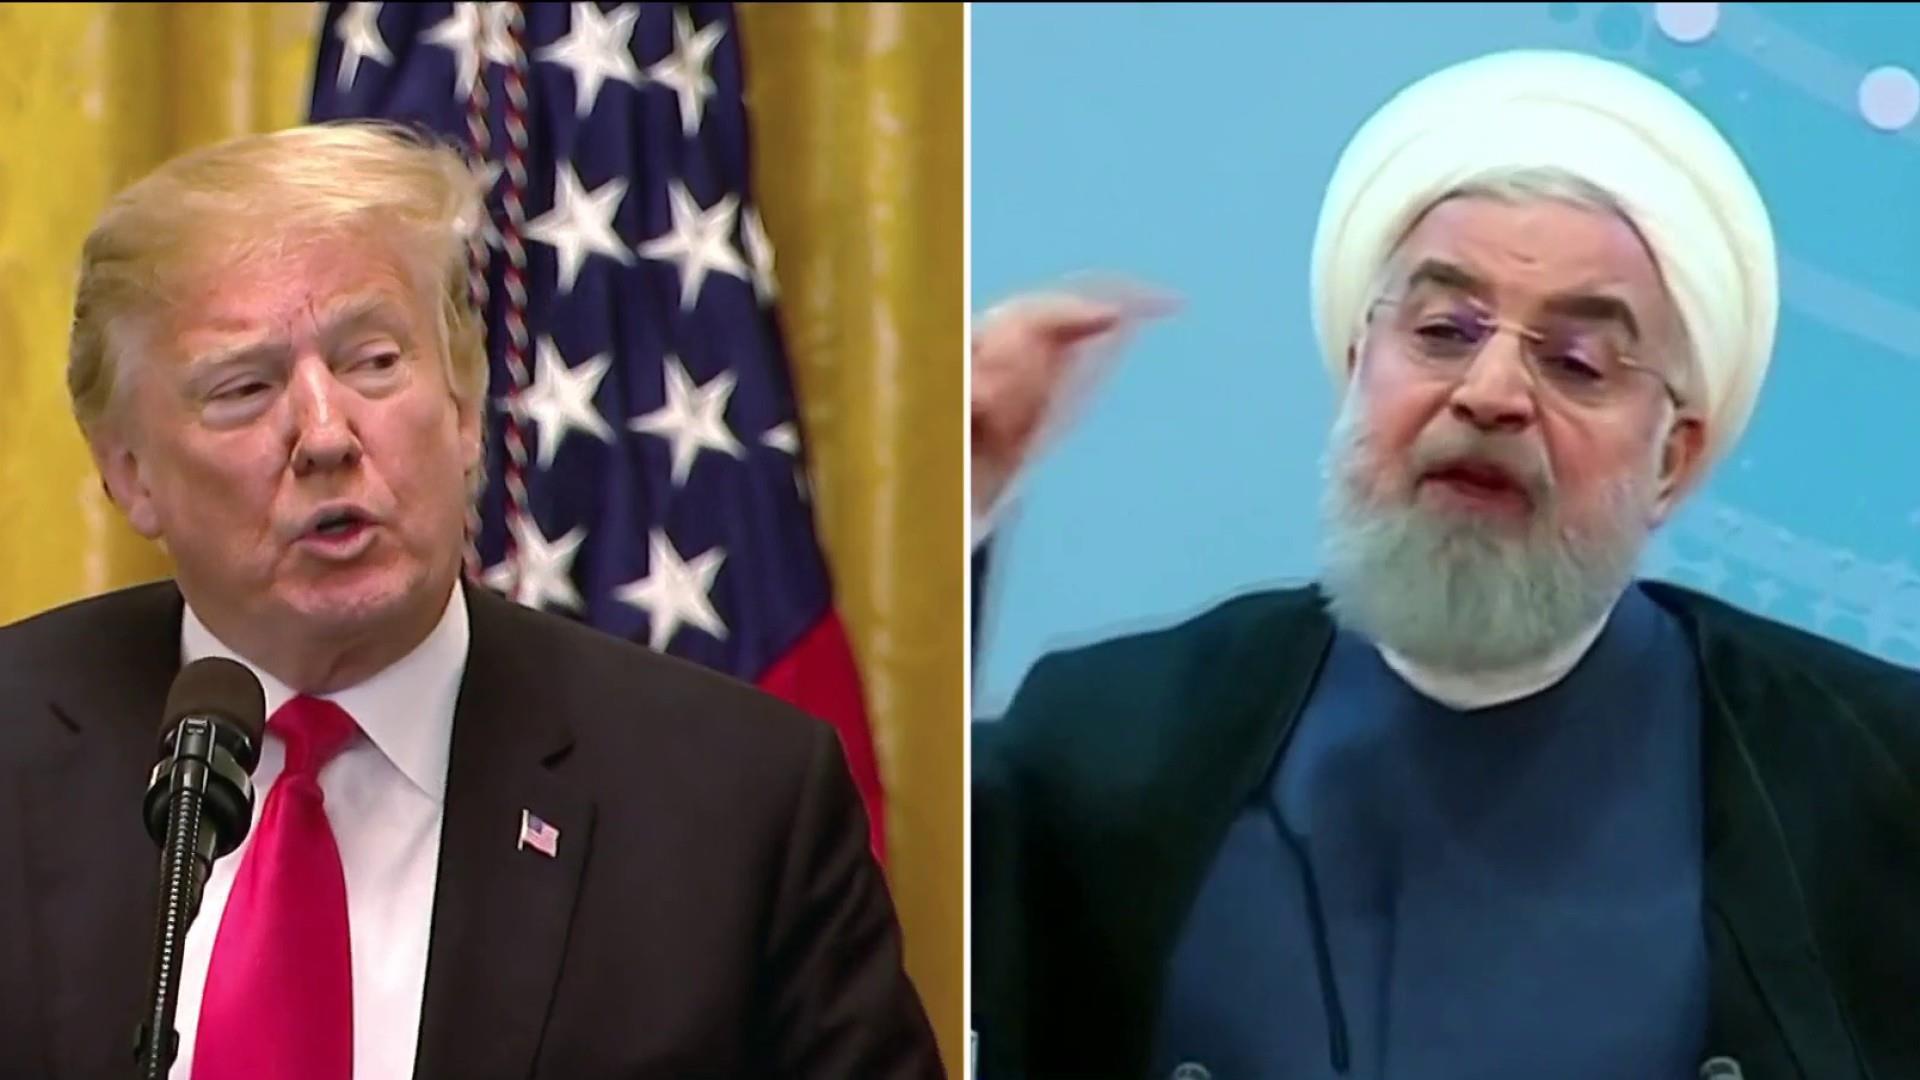 Trump re-imposing trade sanctions on Iran